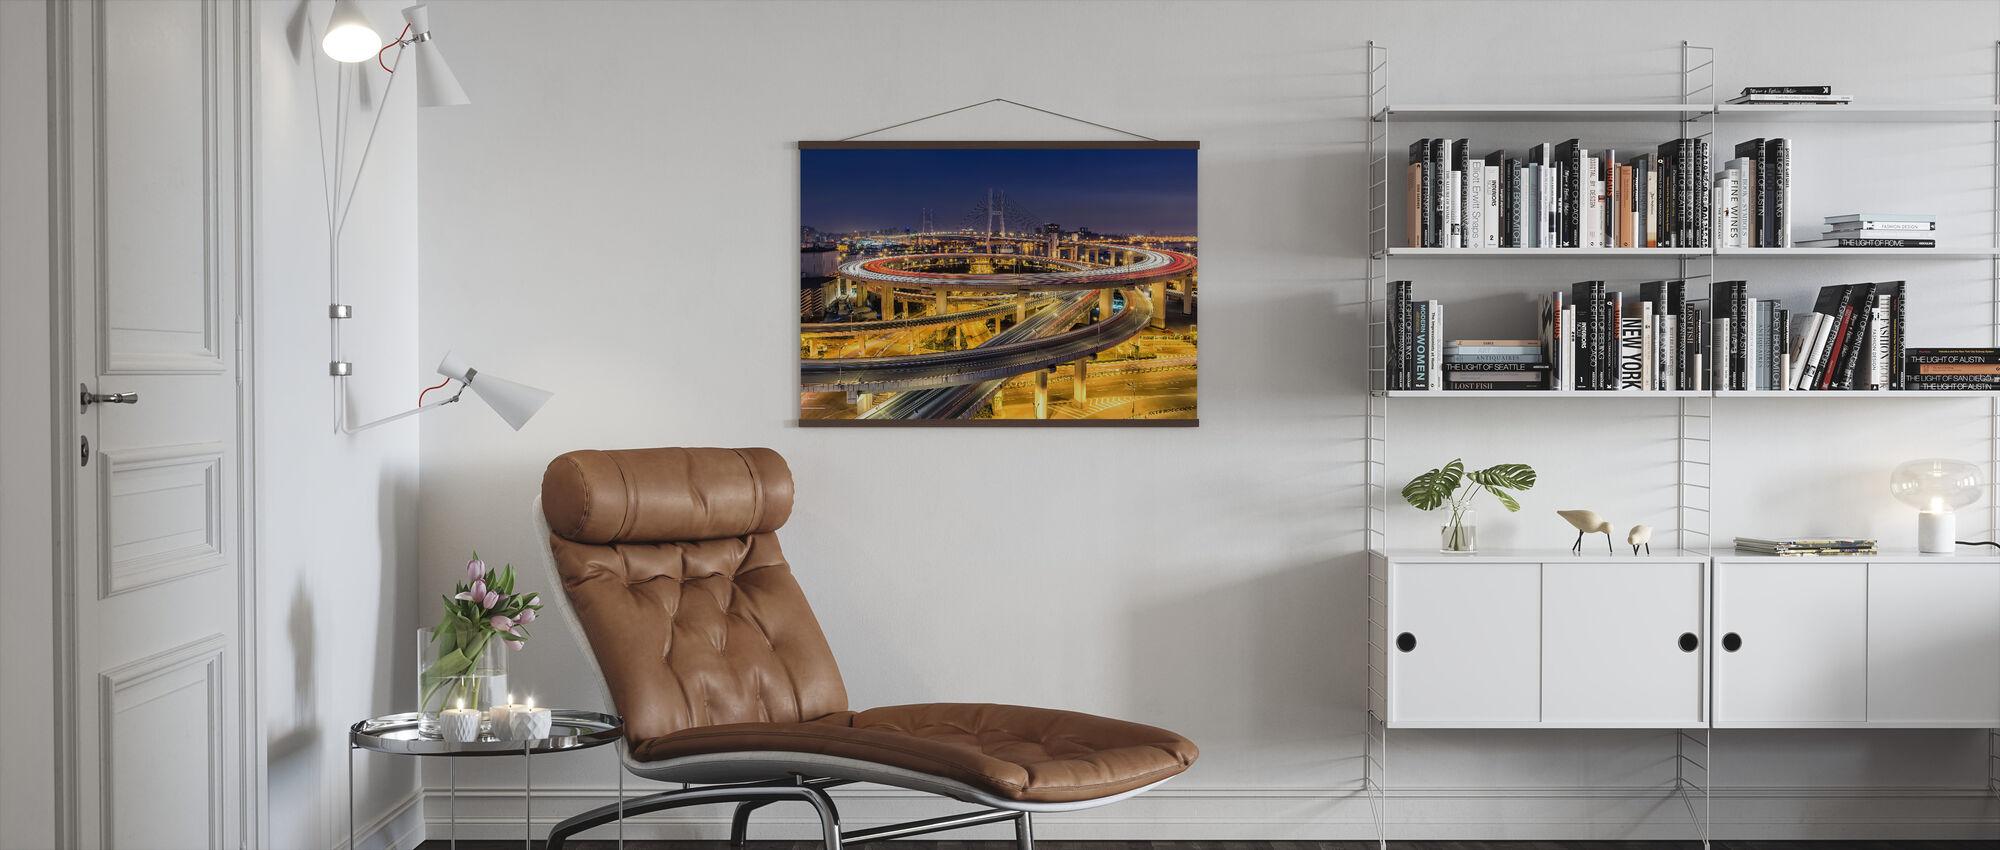 Nanpu Bridge - Poster - Living Room